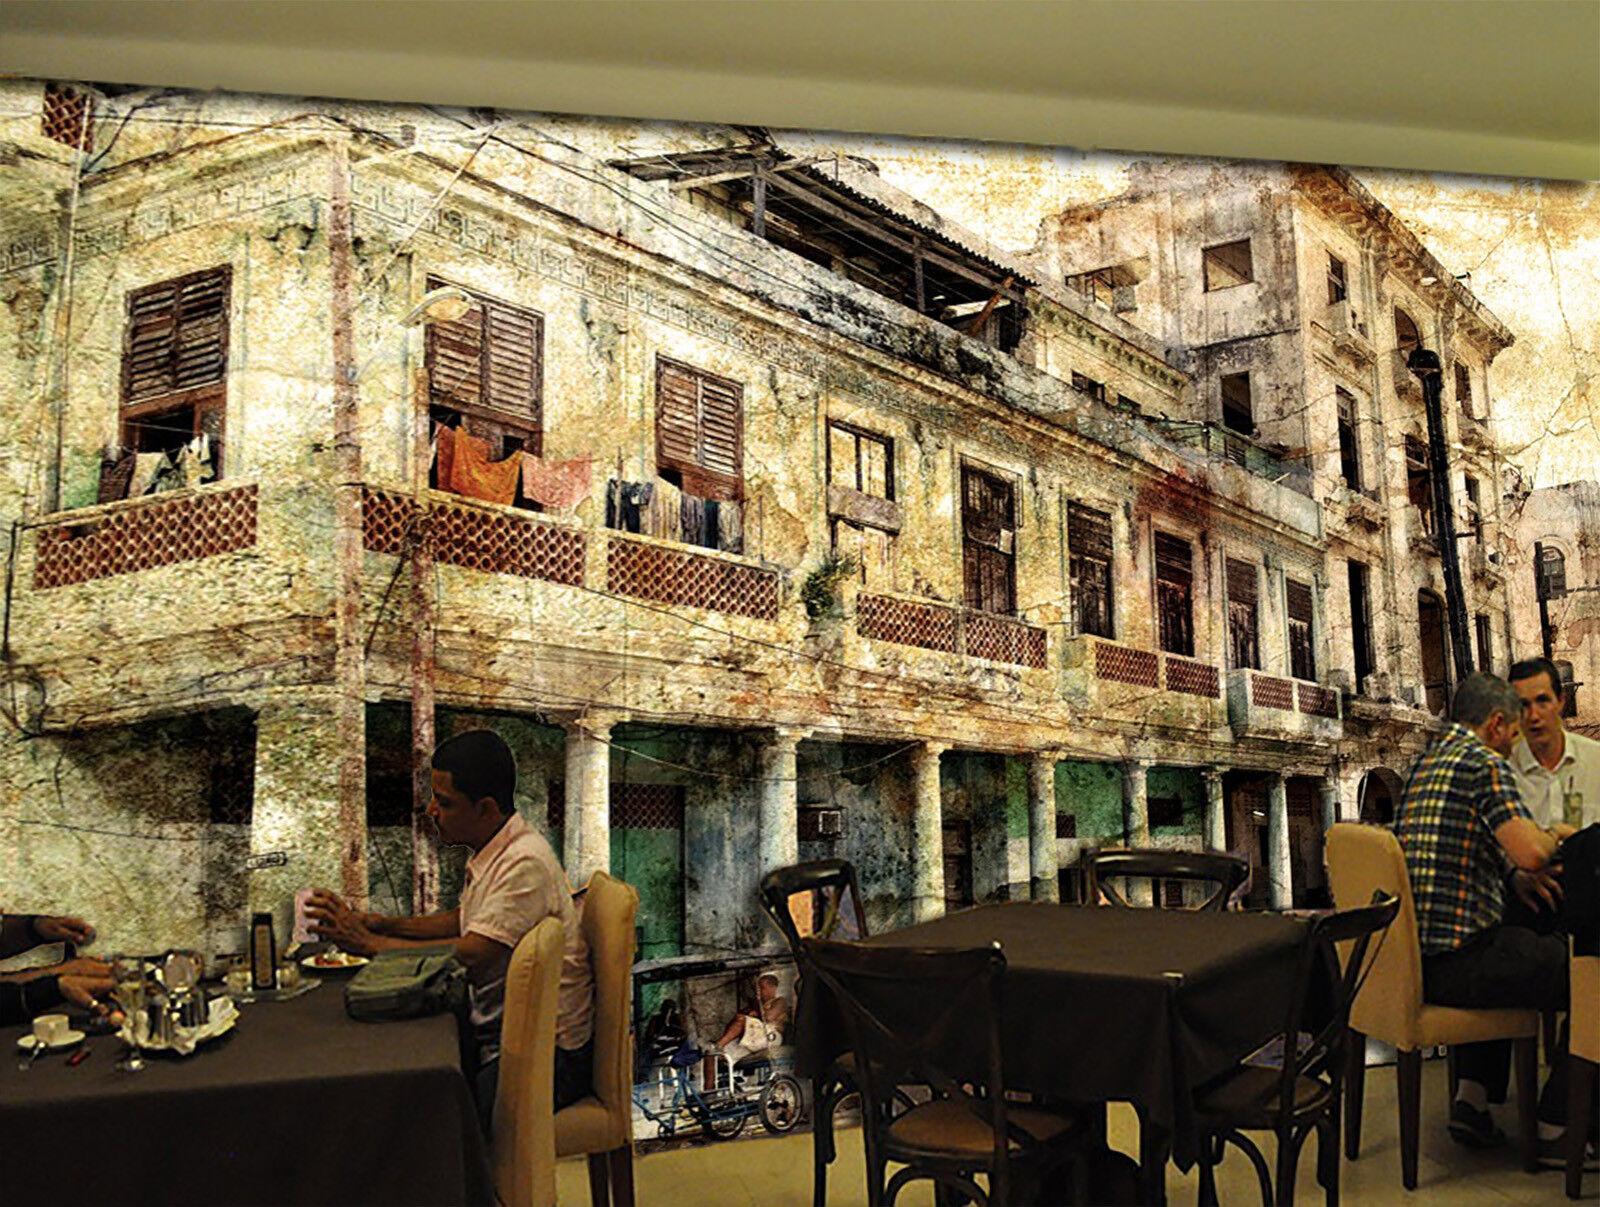 3D Street Old Houses 75 Wall Paper Murals Wall Print Wall Wallpaper Mural AU Kya